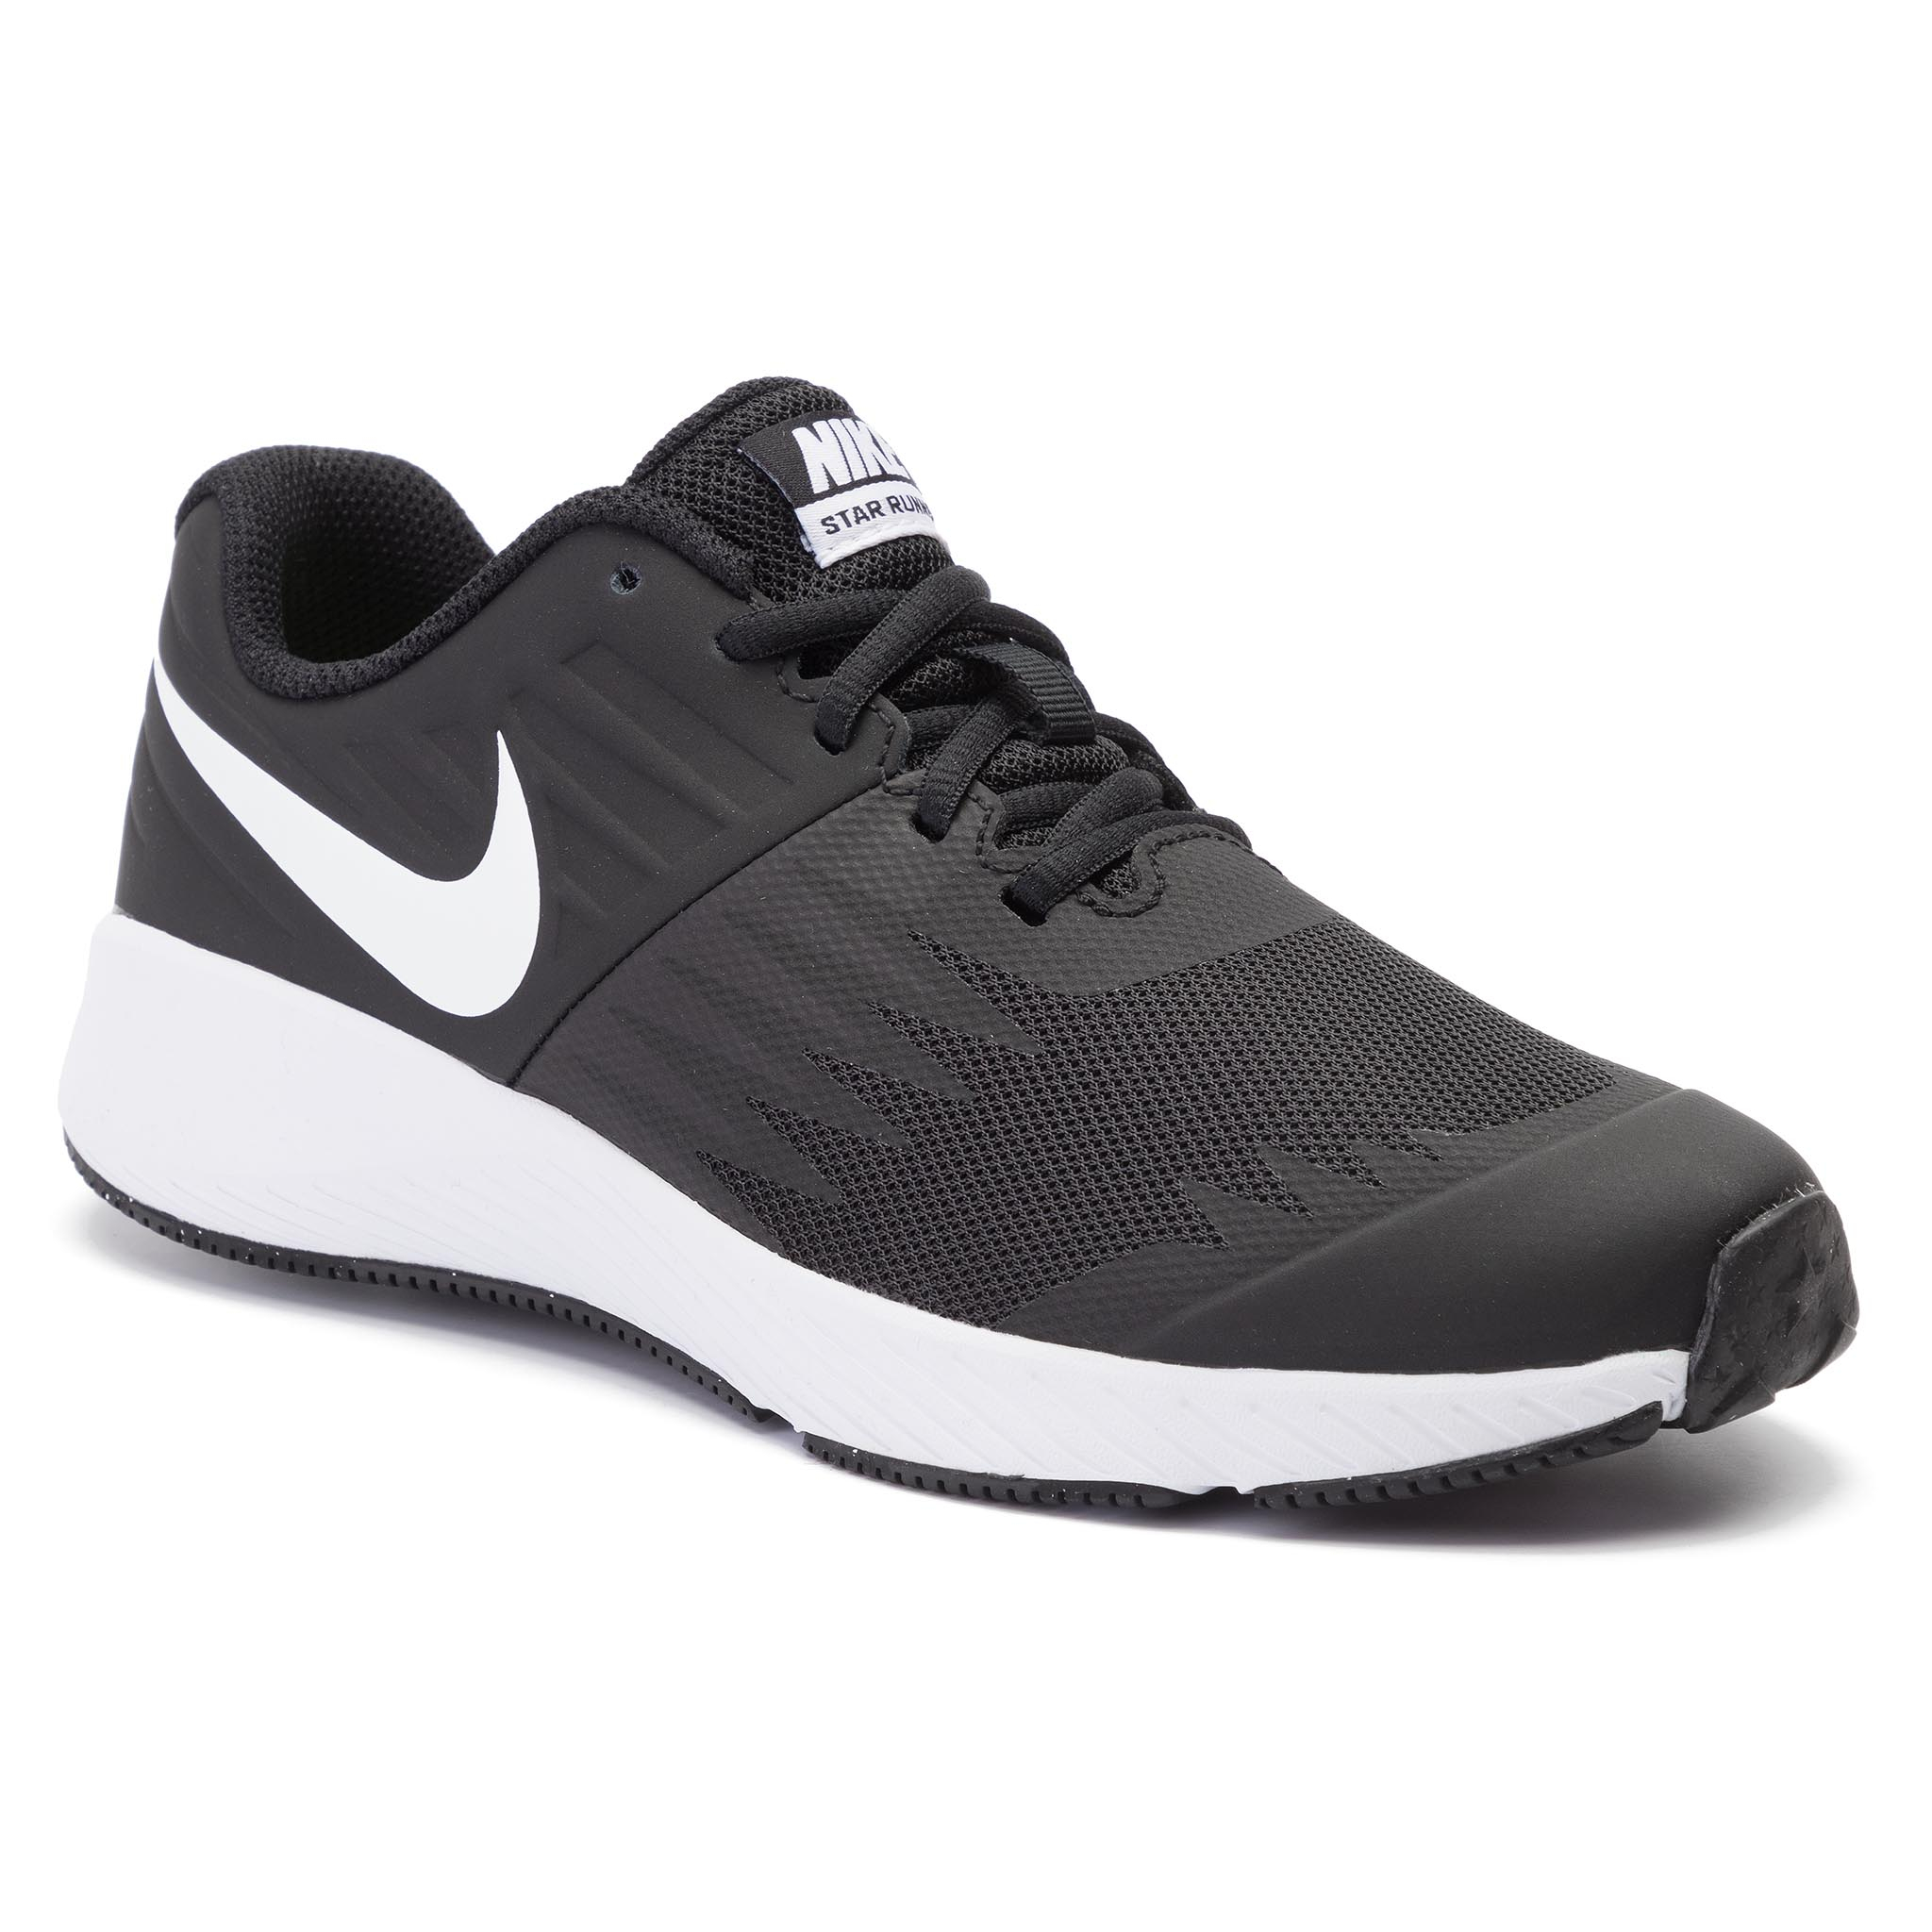 ac0b291b617a7 Shoes ASICS - Patriot 10 Gs 1014A025 Fuchsia Purple/White 500 ...